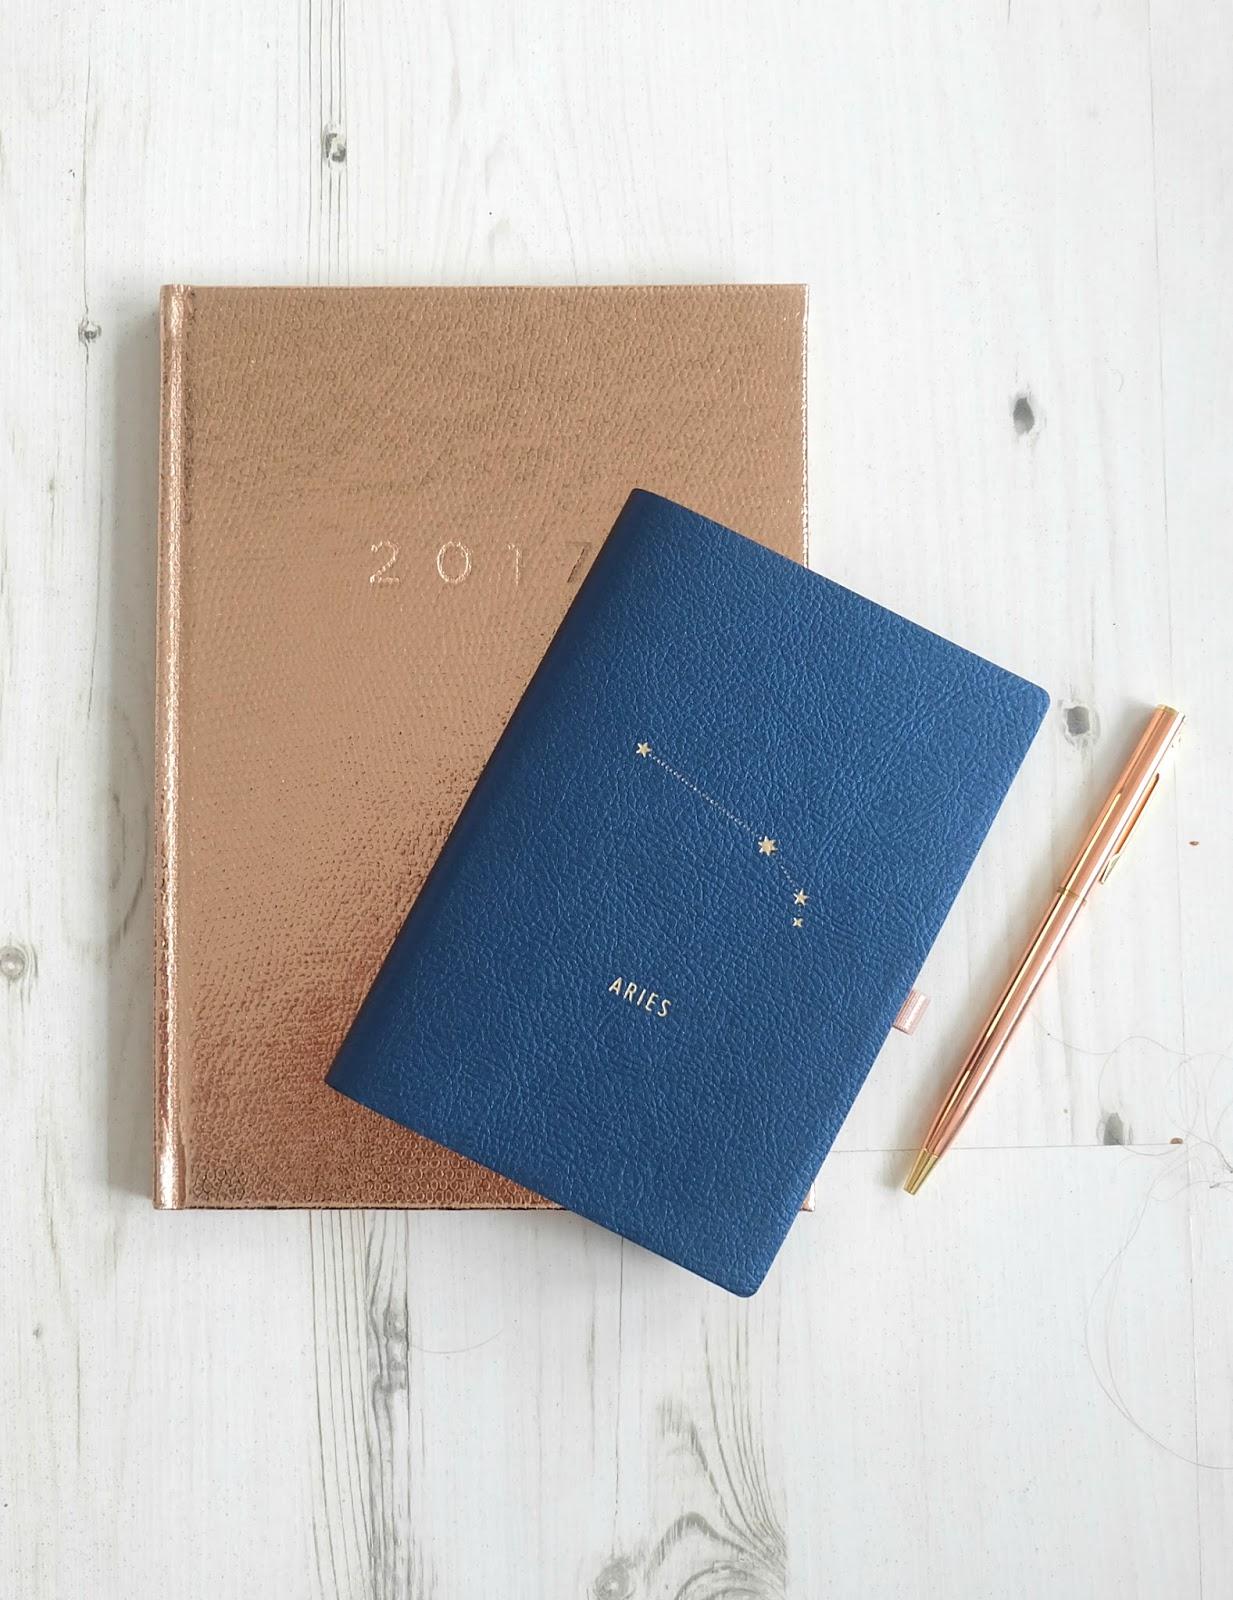 anthropologies aries notebook